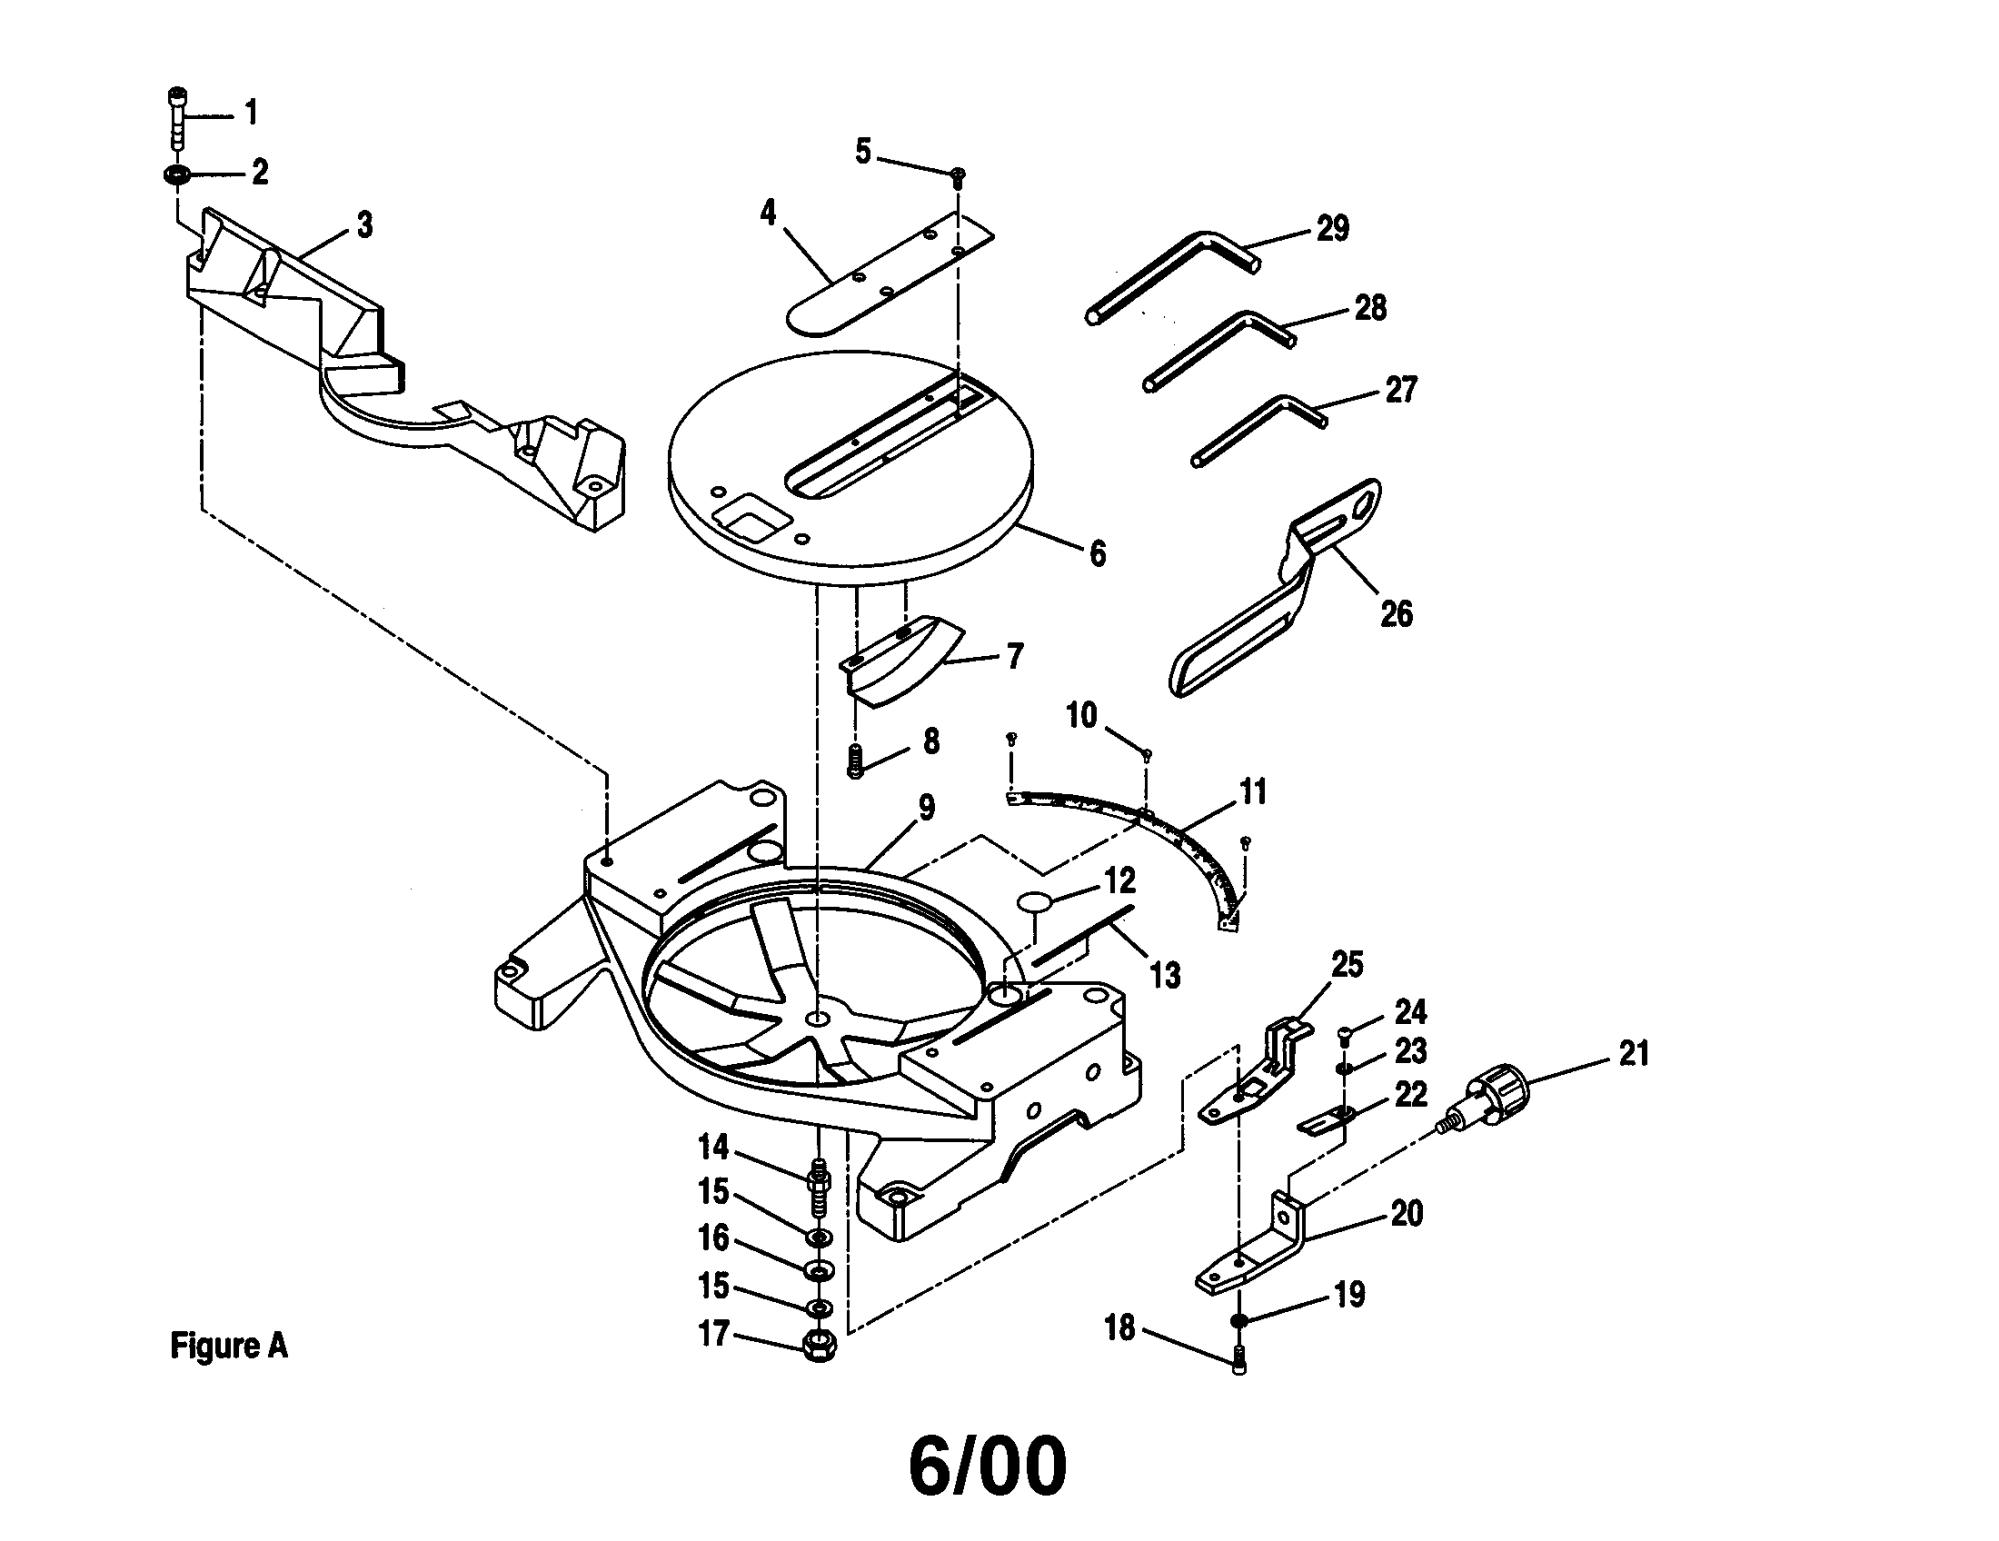 hight resolution of craftsman 10 u0026quot compound miter saw parts